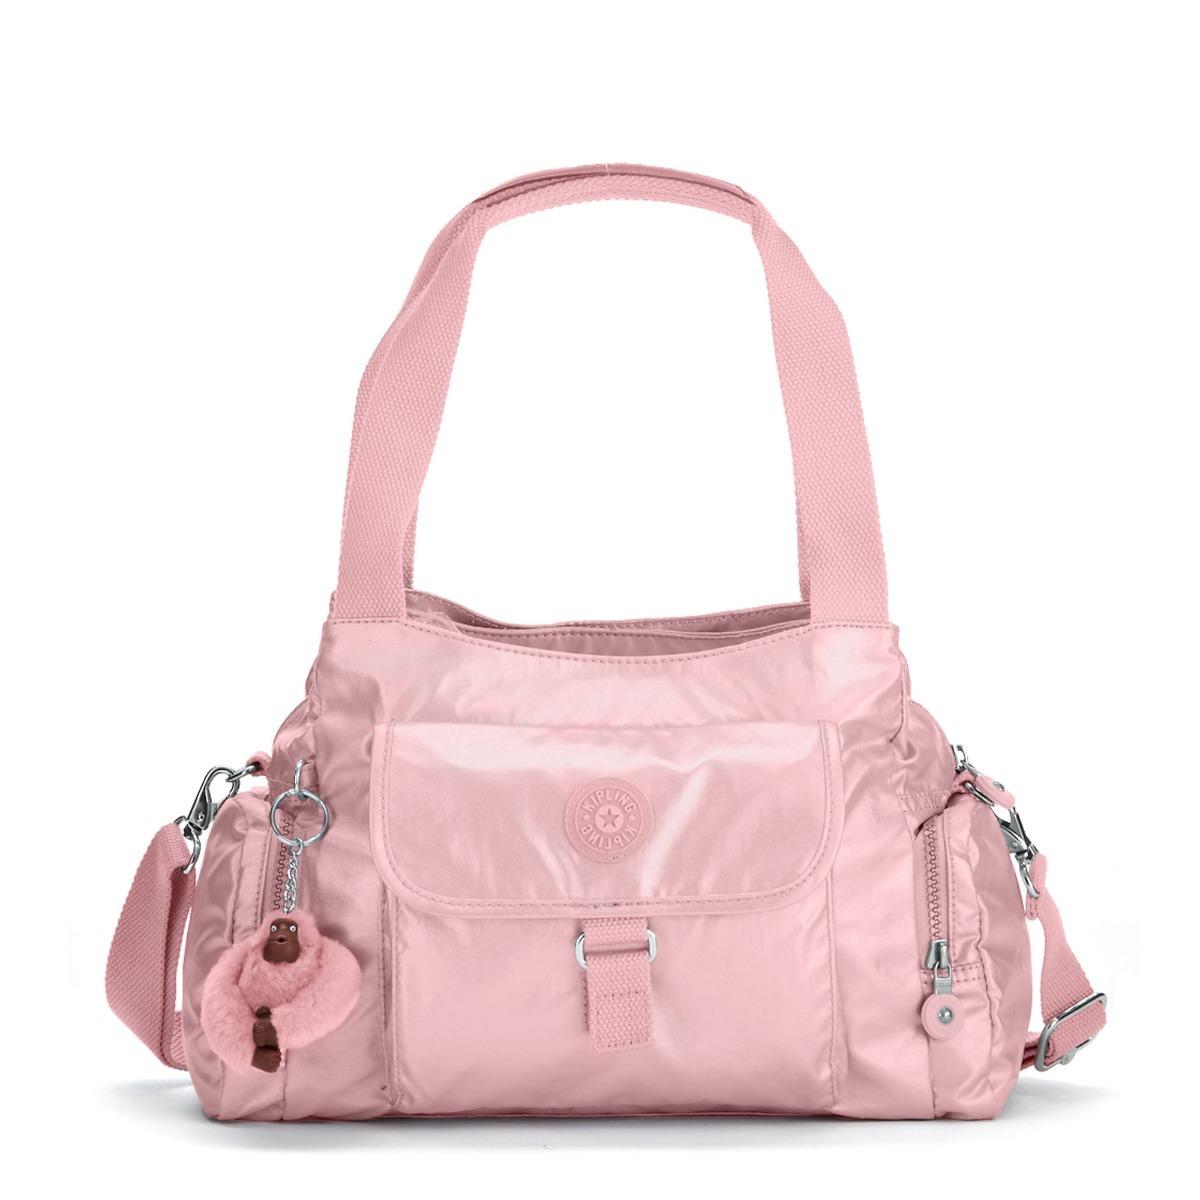 7a9ff631b Bolso Kipling Felix Icy Rose Metallic - $ 260.000 en Mercado Libre